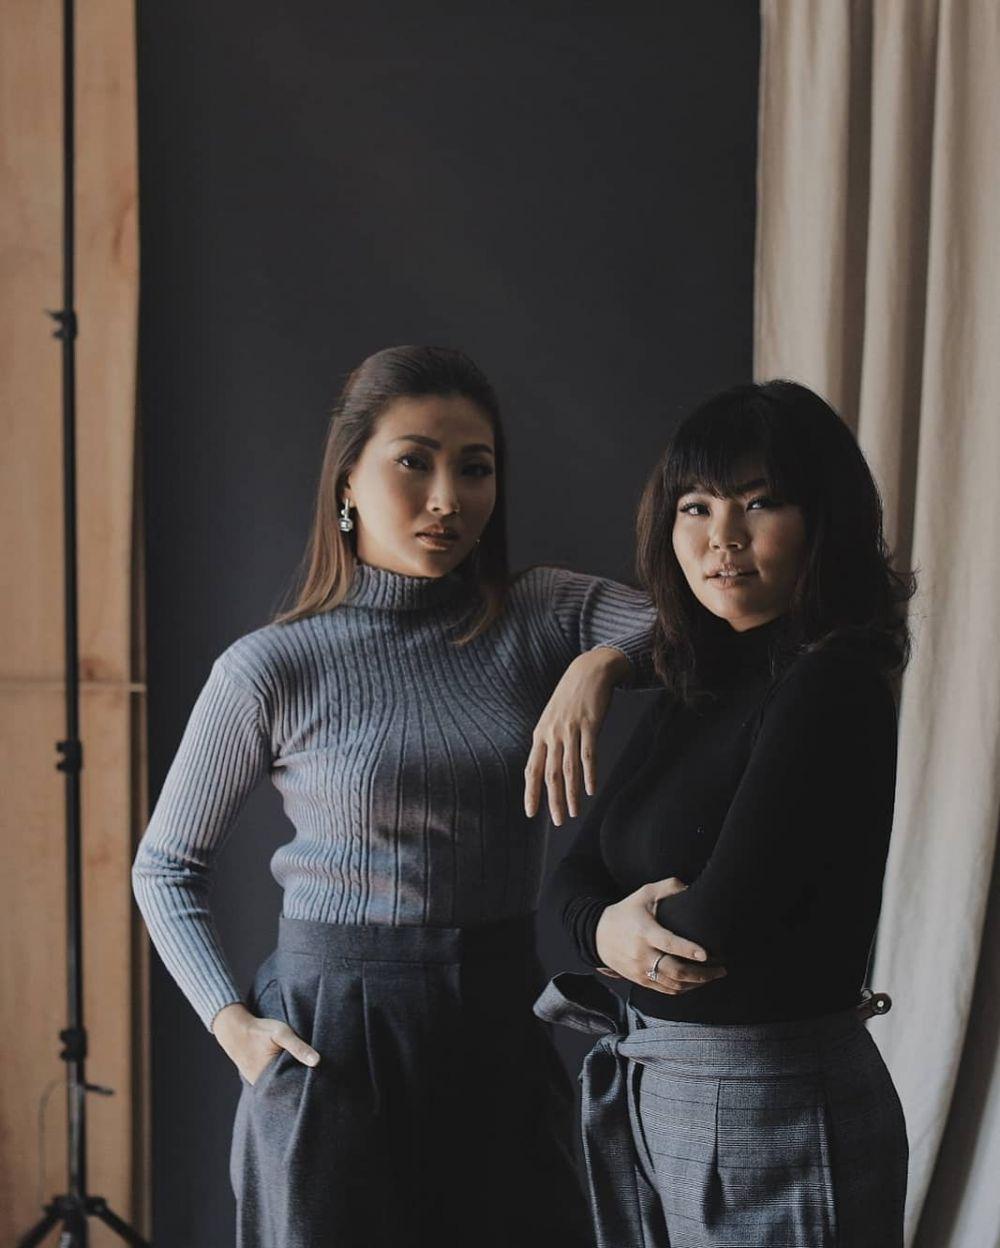 Wendah dan Wendy bersama Instagram